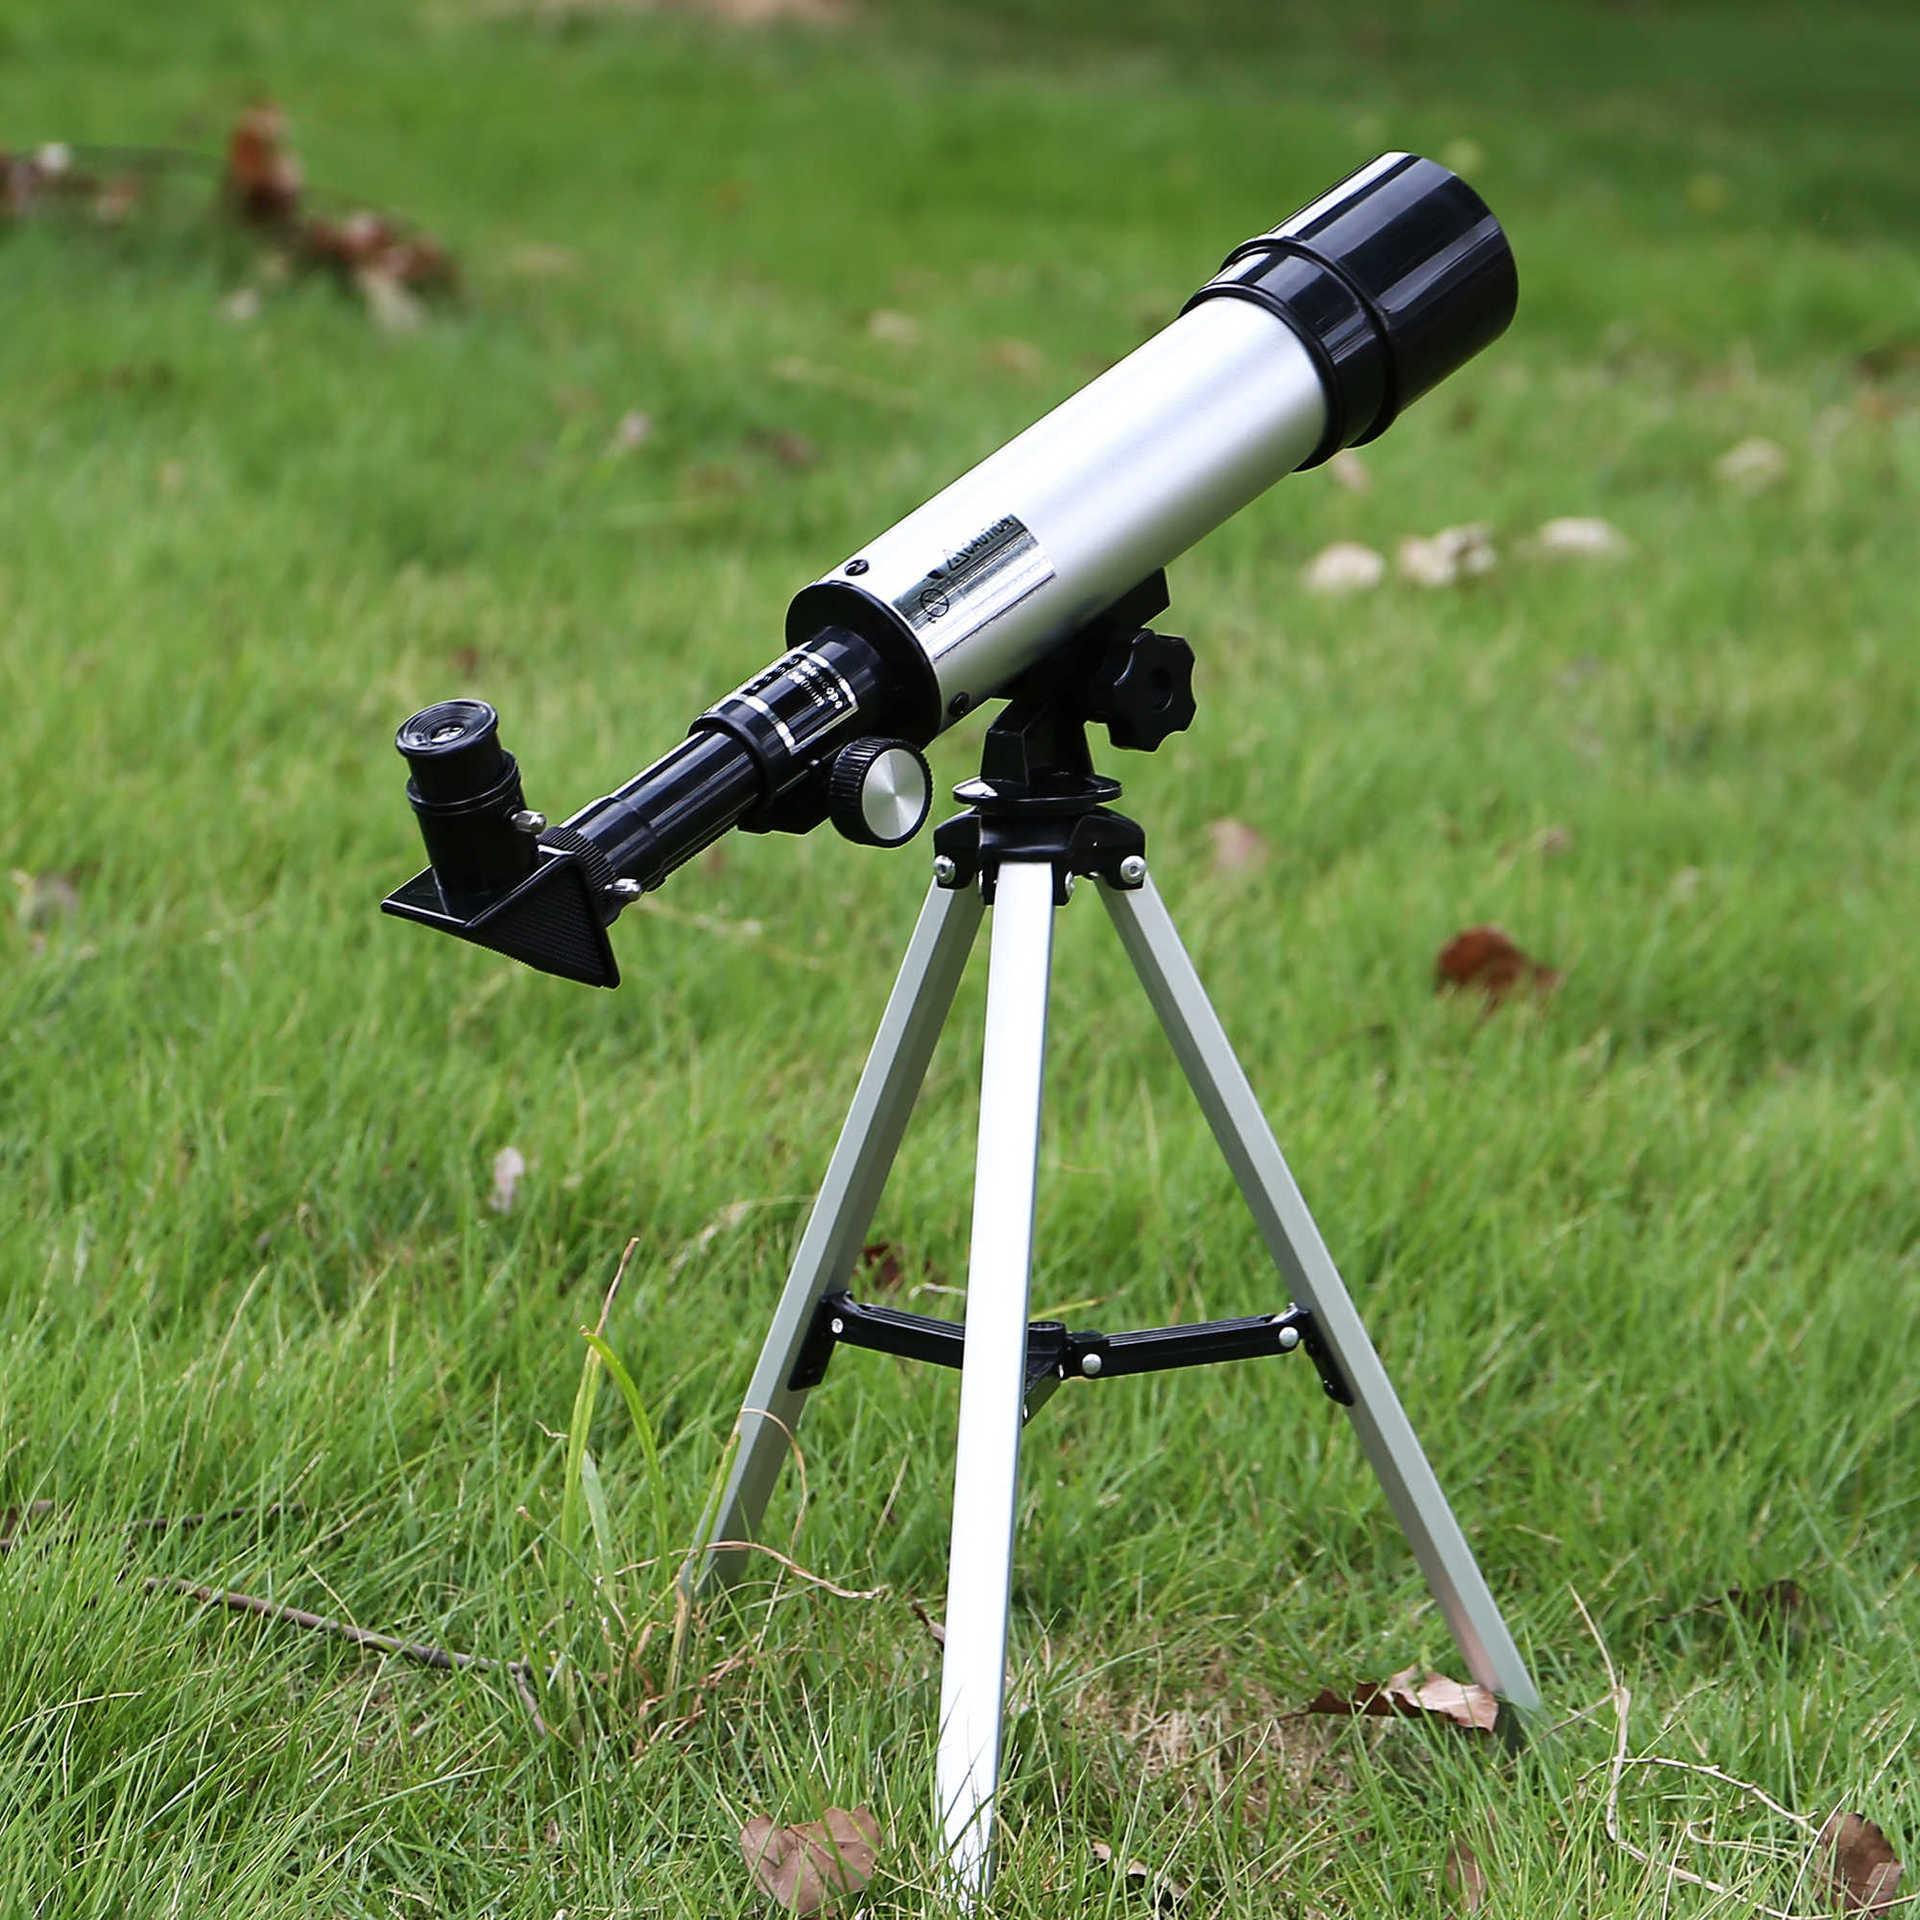 Image 3 - فلكية للهواتف الذكية تلسكوب عدسات تكبير 30x 60X كاميرا واحدة HD  تلسكوب المقربة مع العدسات كليب للهاتف المحمول-في عدسات الهاتف المحمول من  الهواتف المحمولة ووسائل الاتصالات على